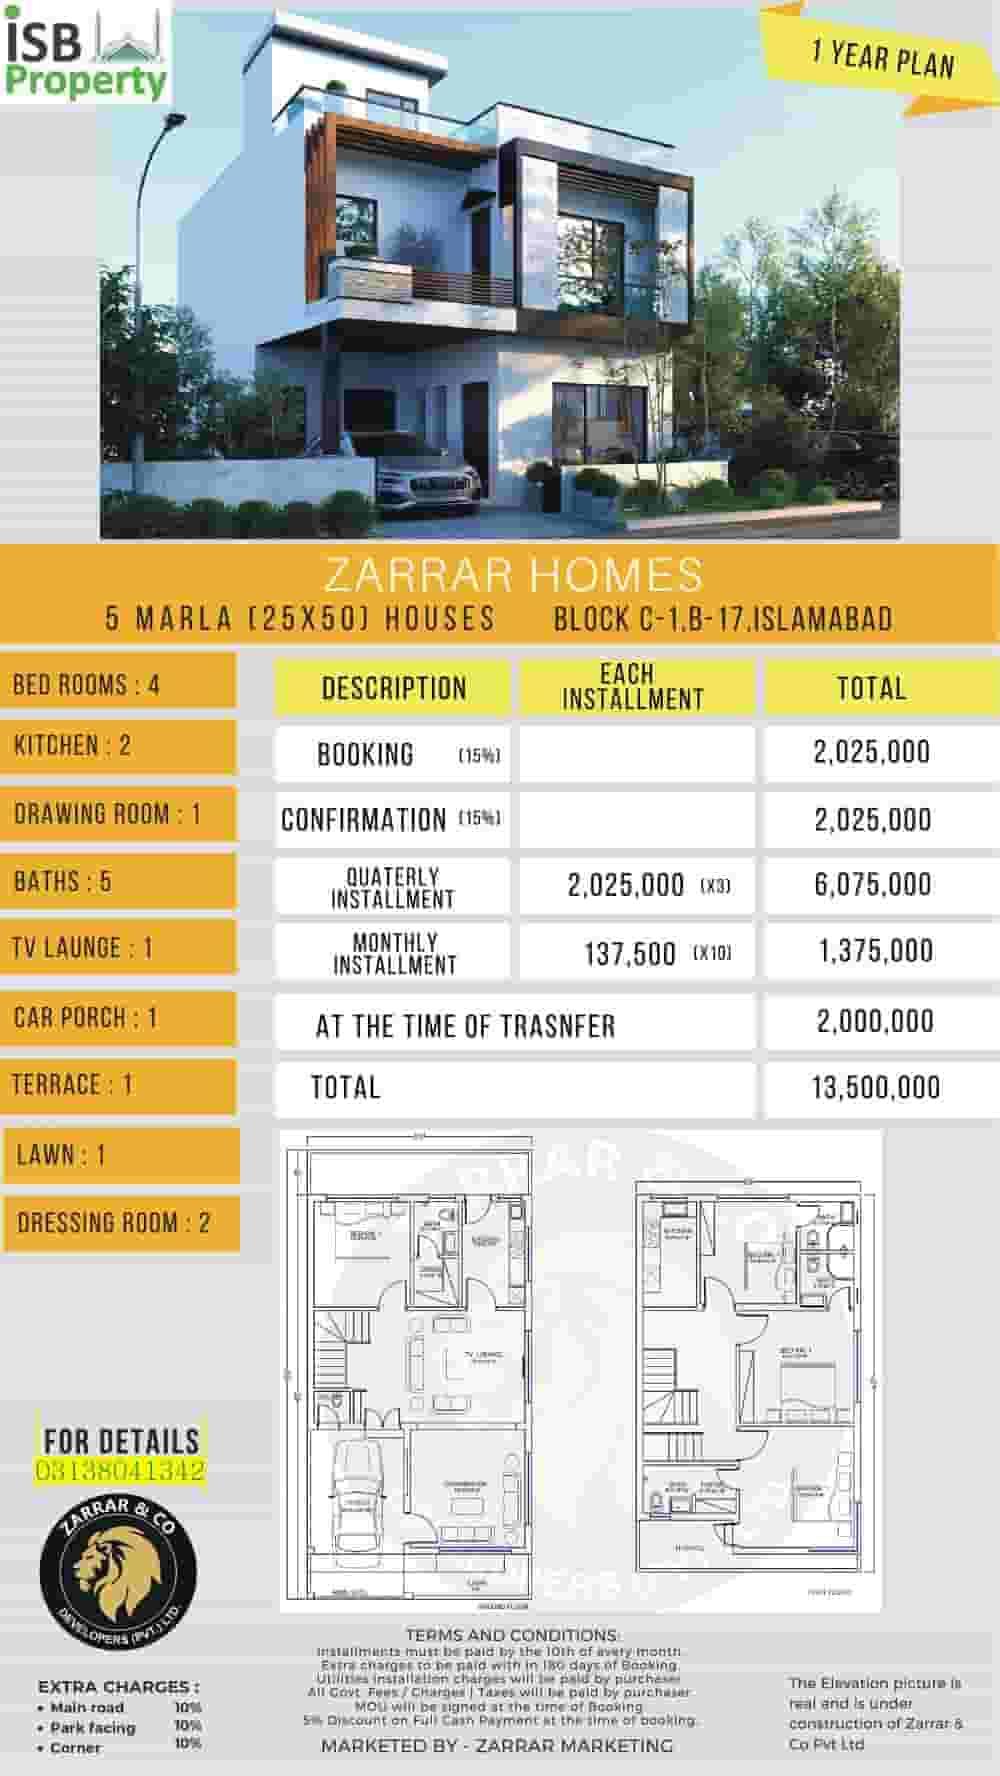 Zarar Homes 5 Marla 1 Year Plan 1